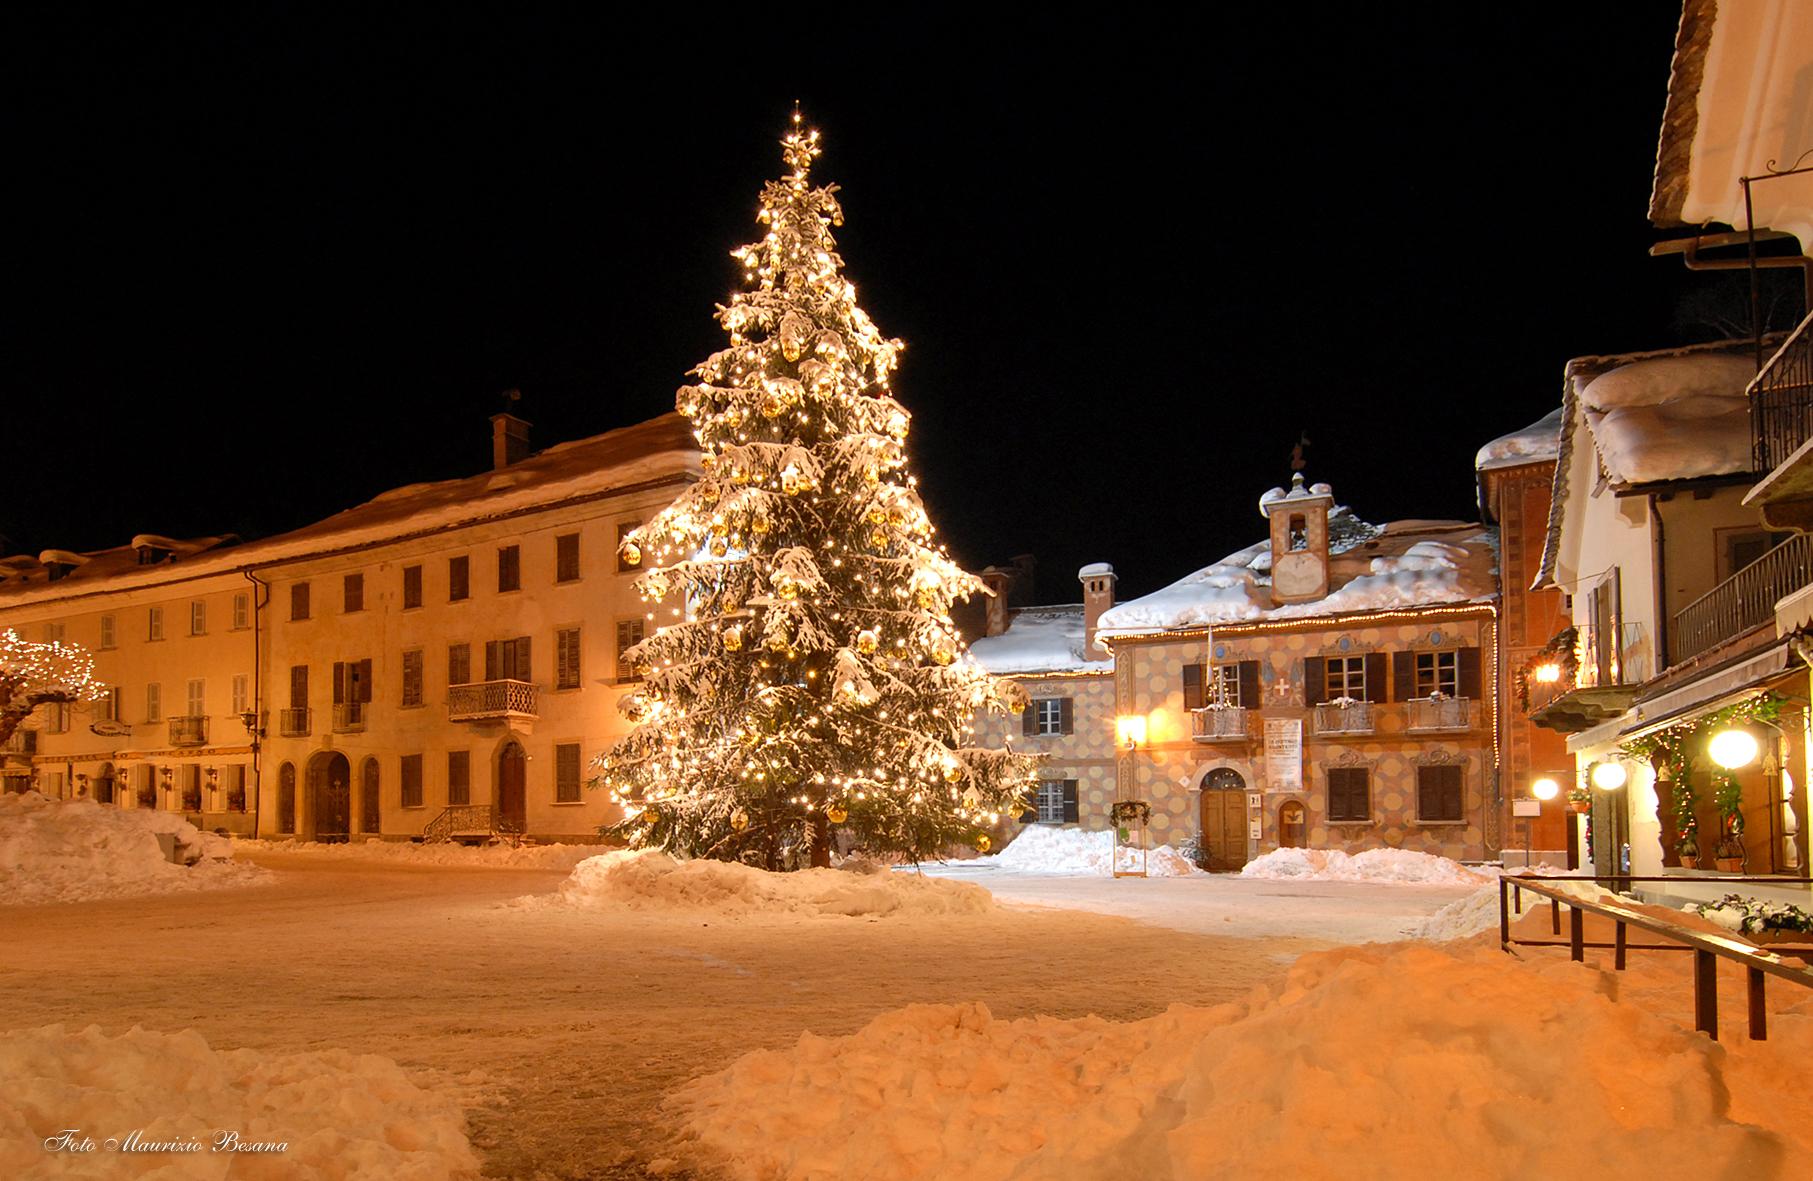 Natale SMM_Maurizio_Besana